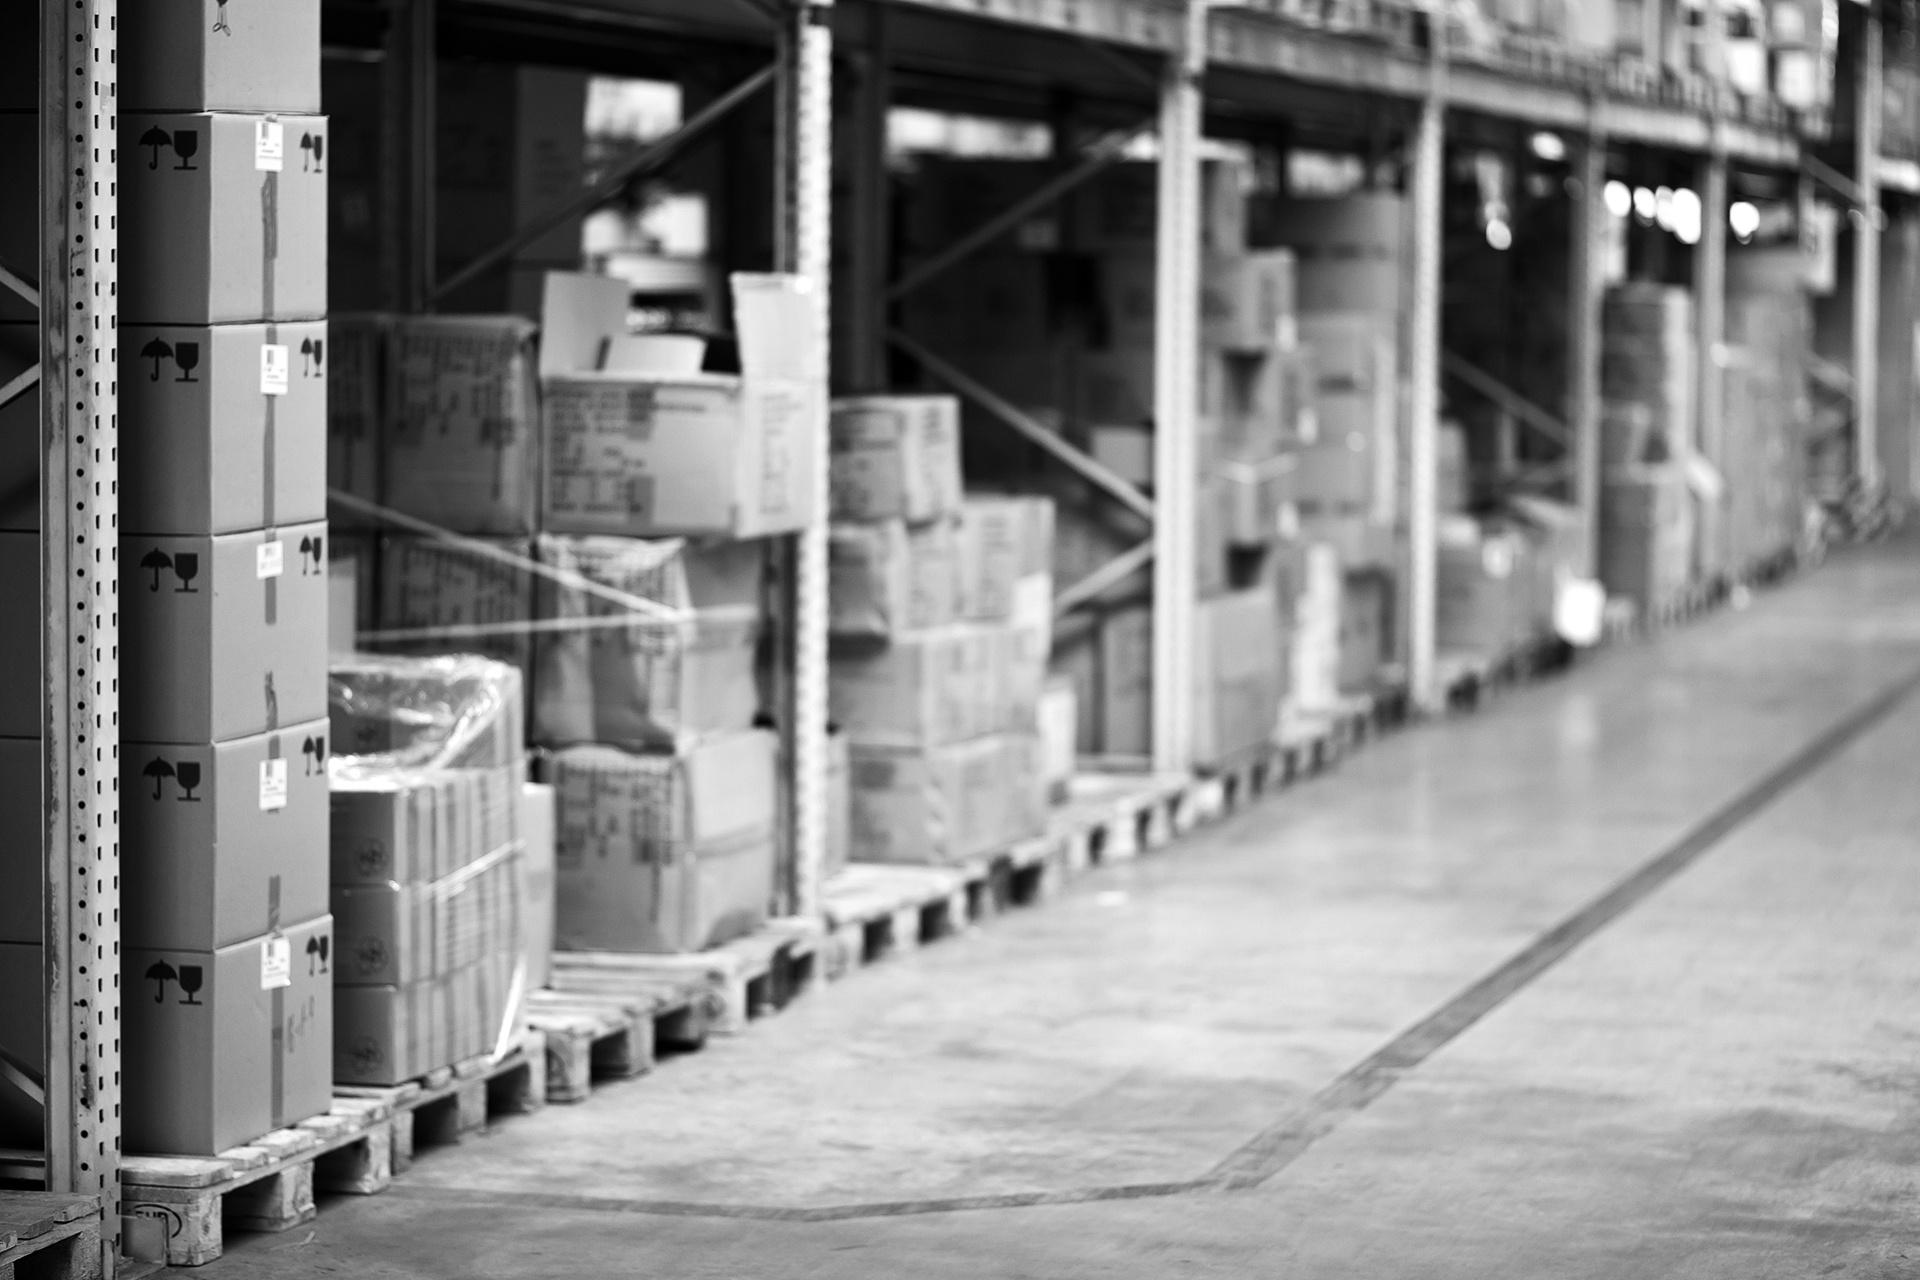 warehouse background1920x1300.jpg